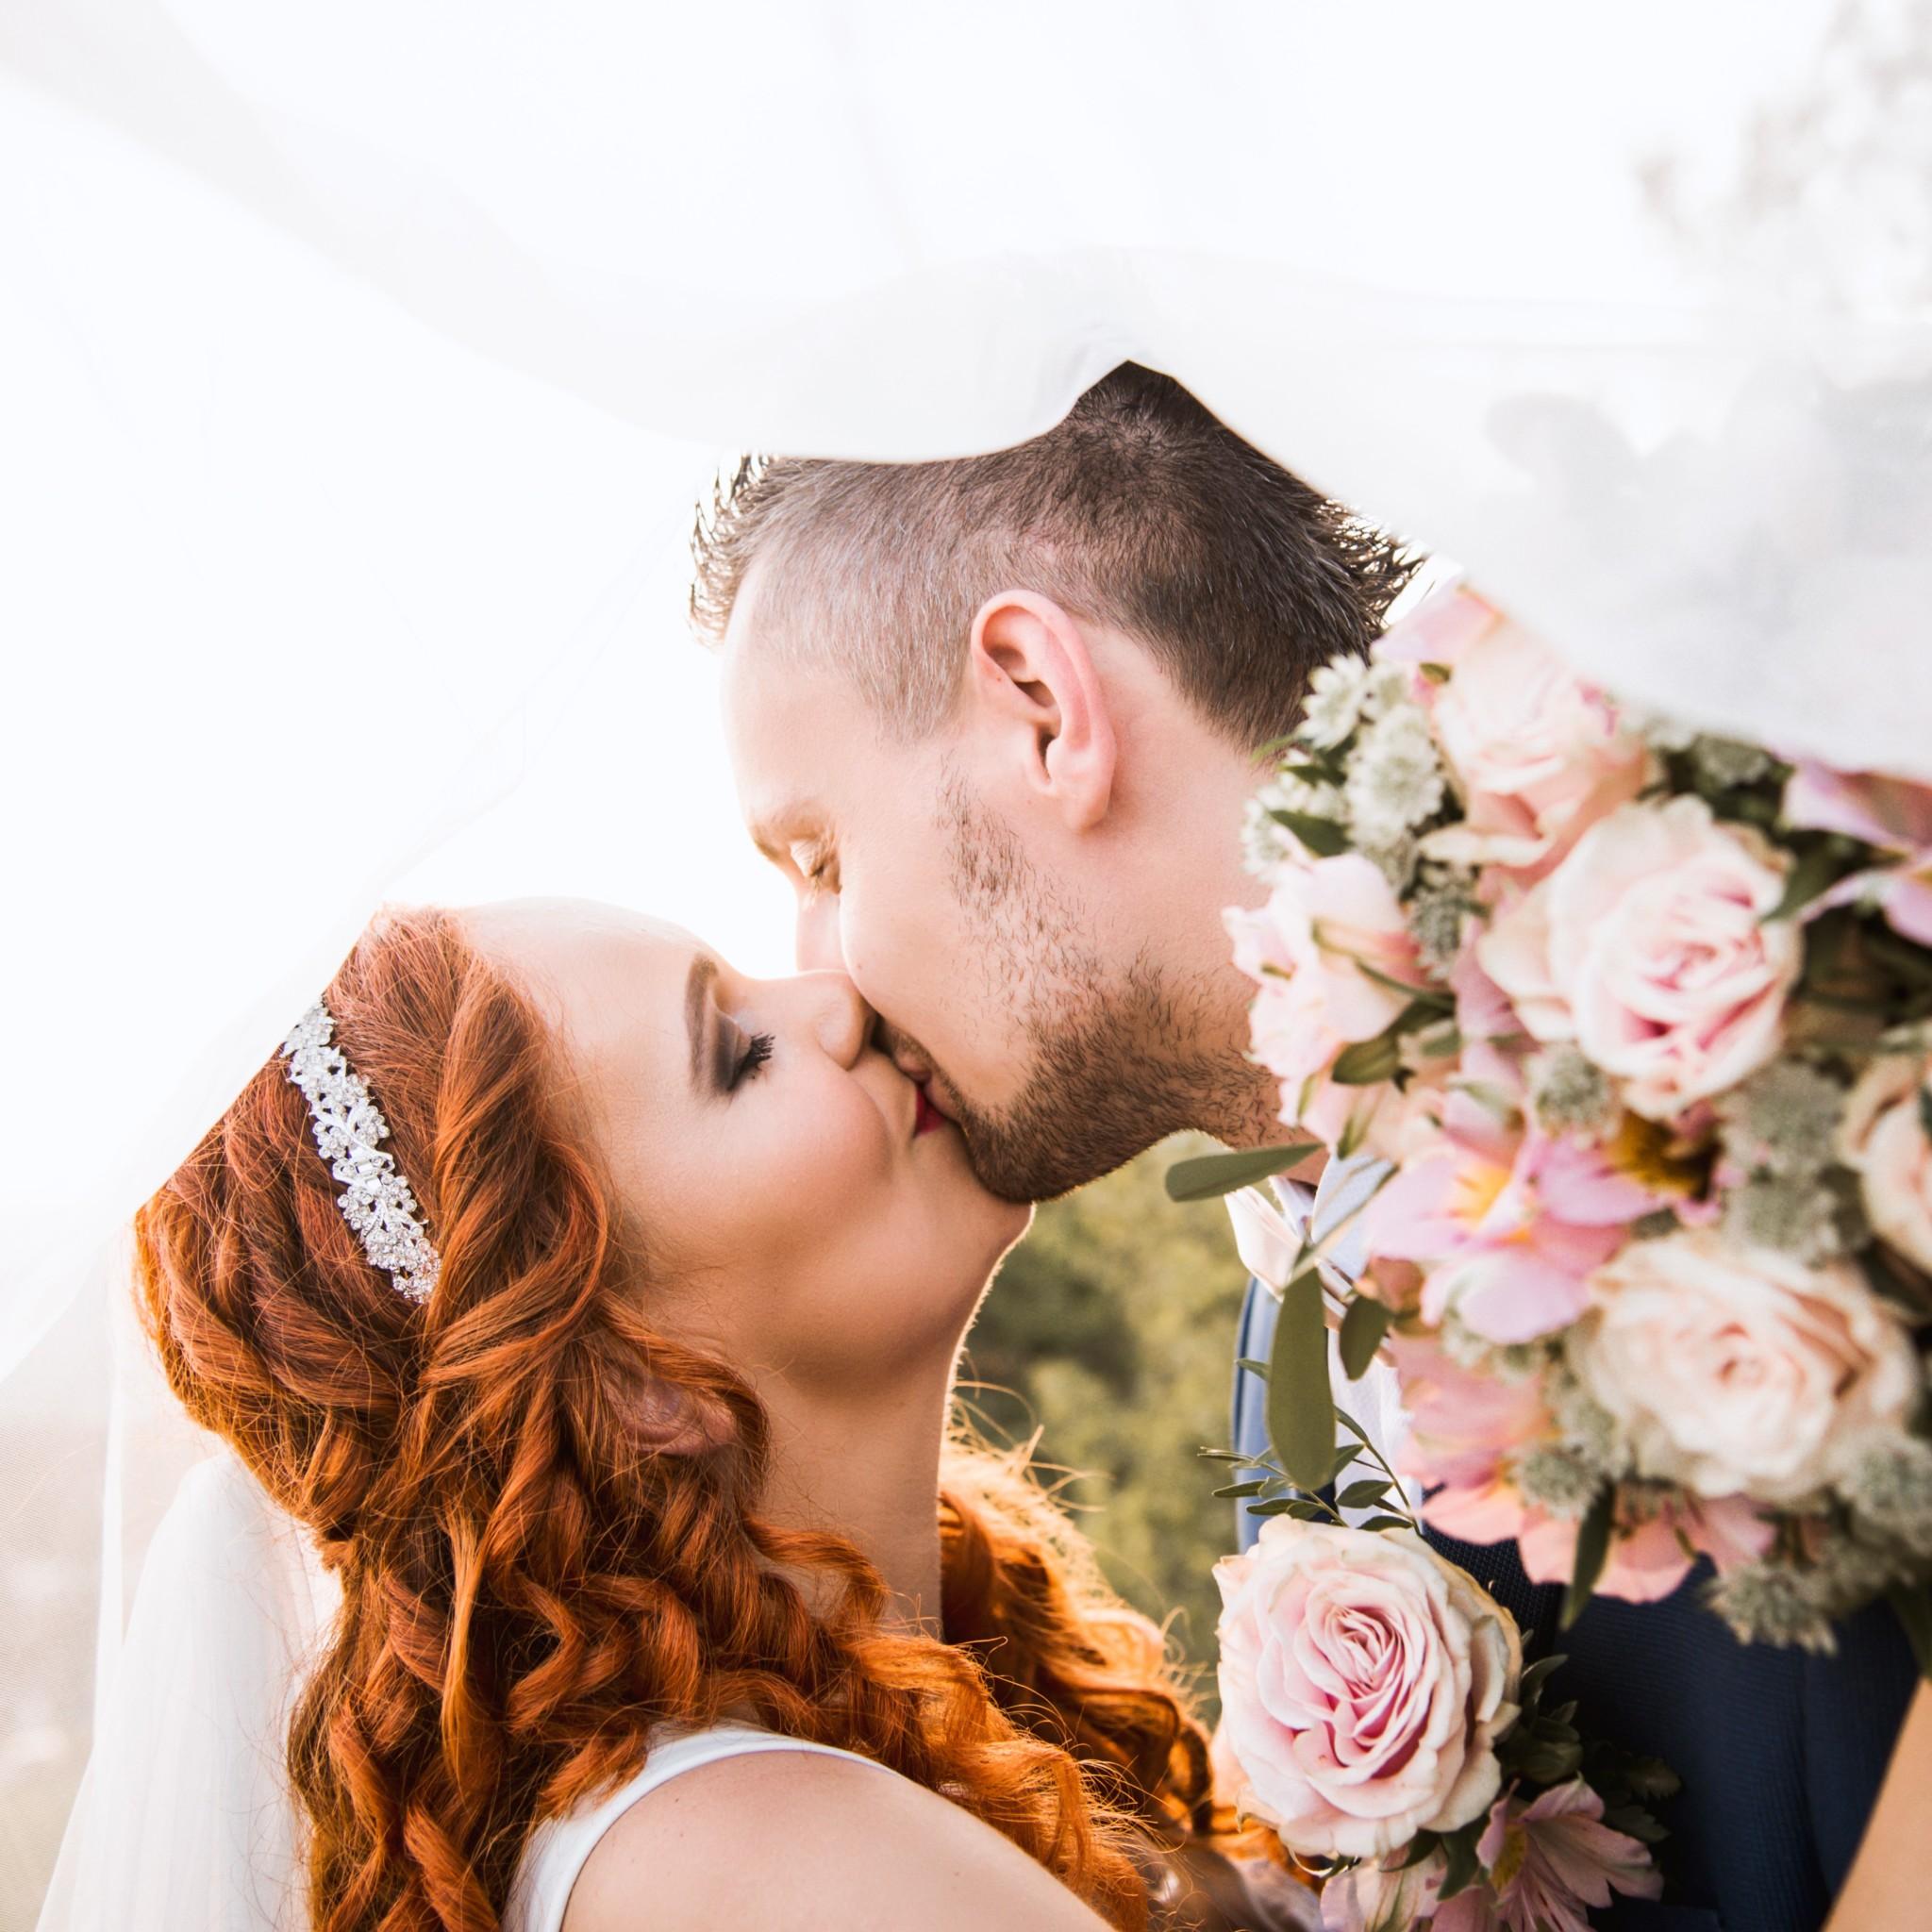 Svadobné fotografie a krst